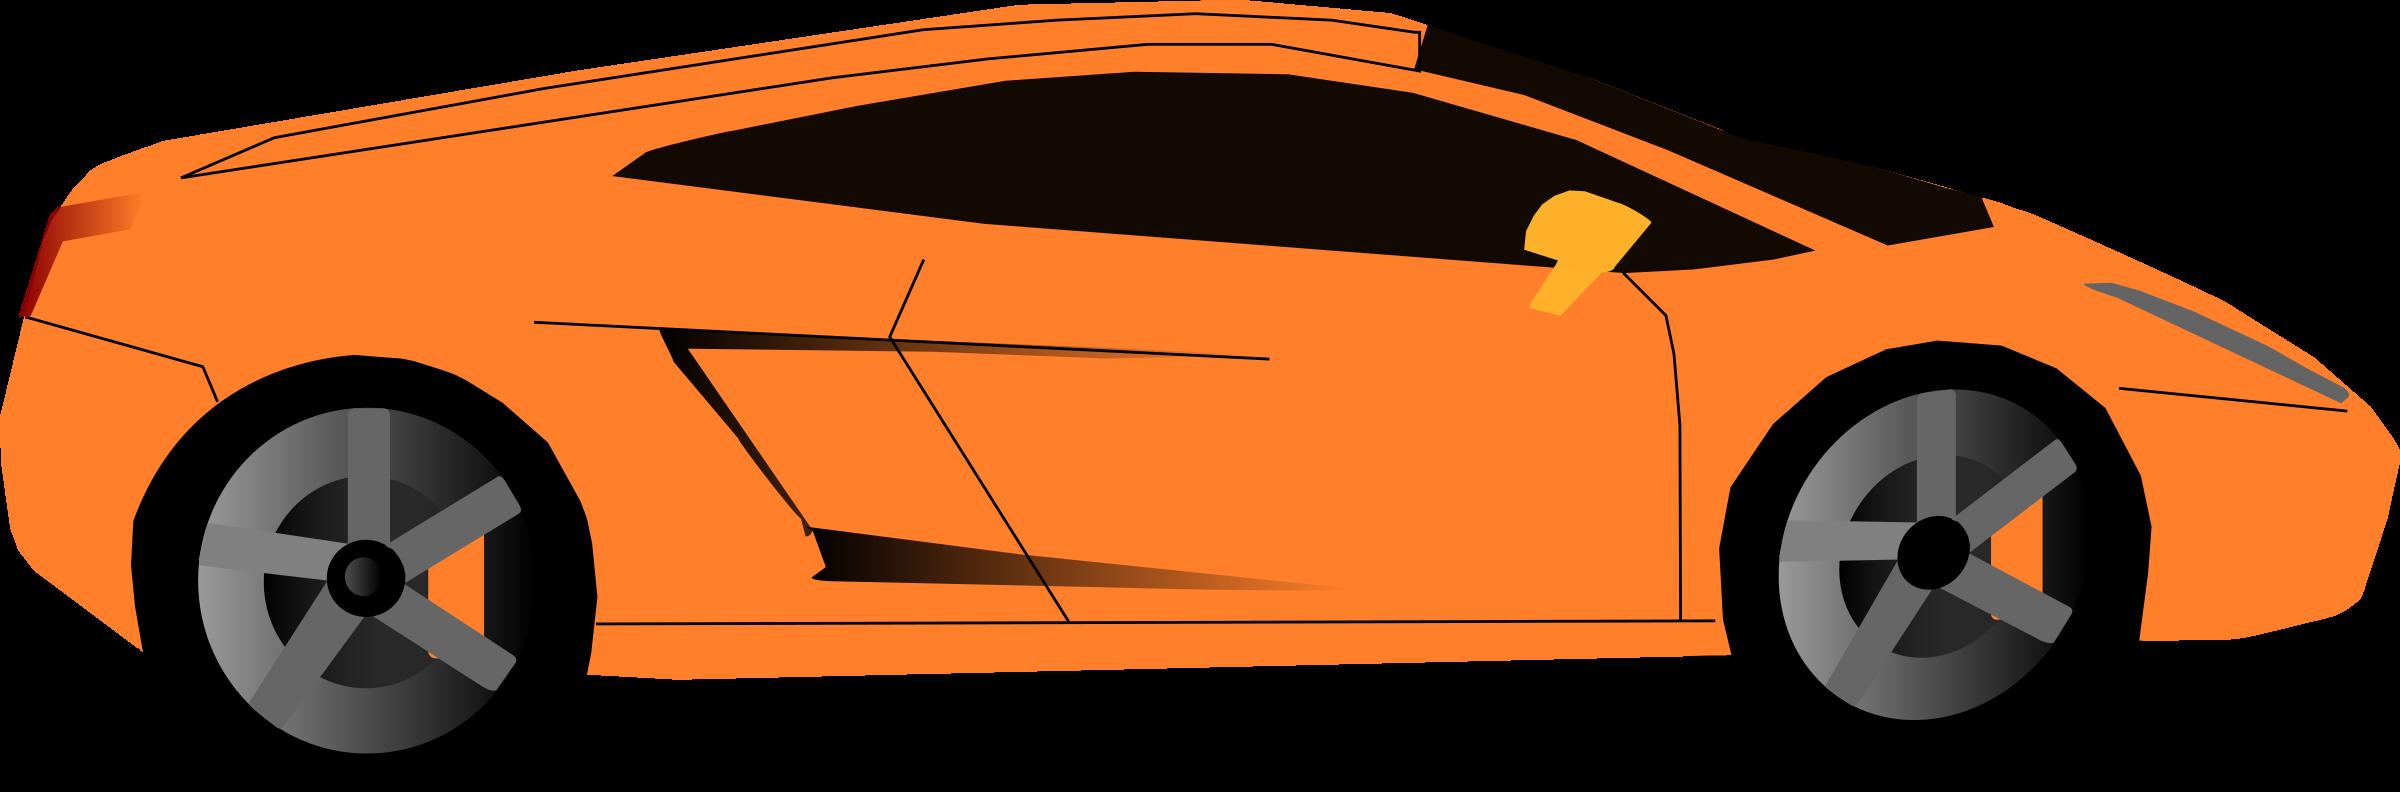 Big image png. Clipart car orange